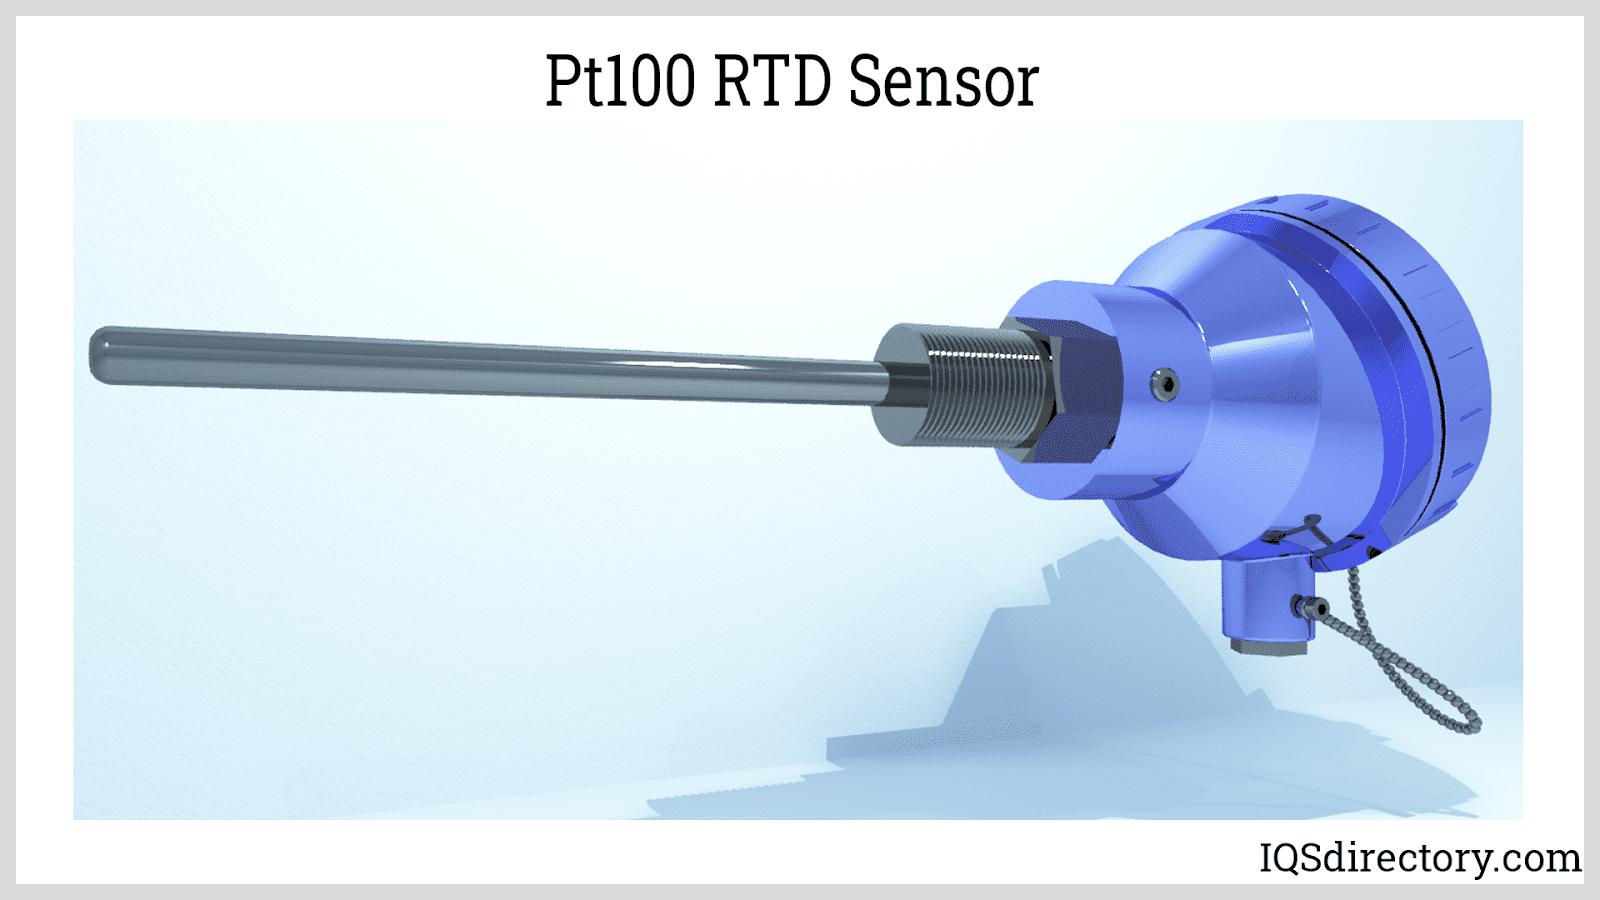 Pt100 RTD Sensor